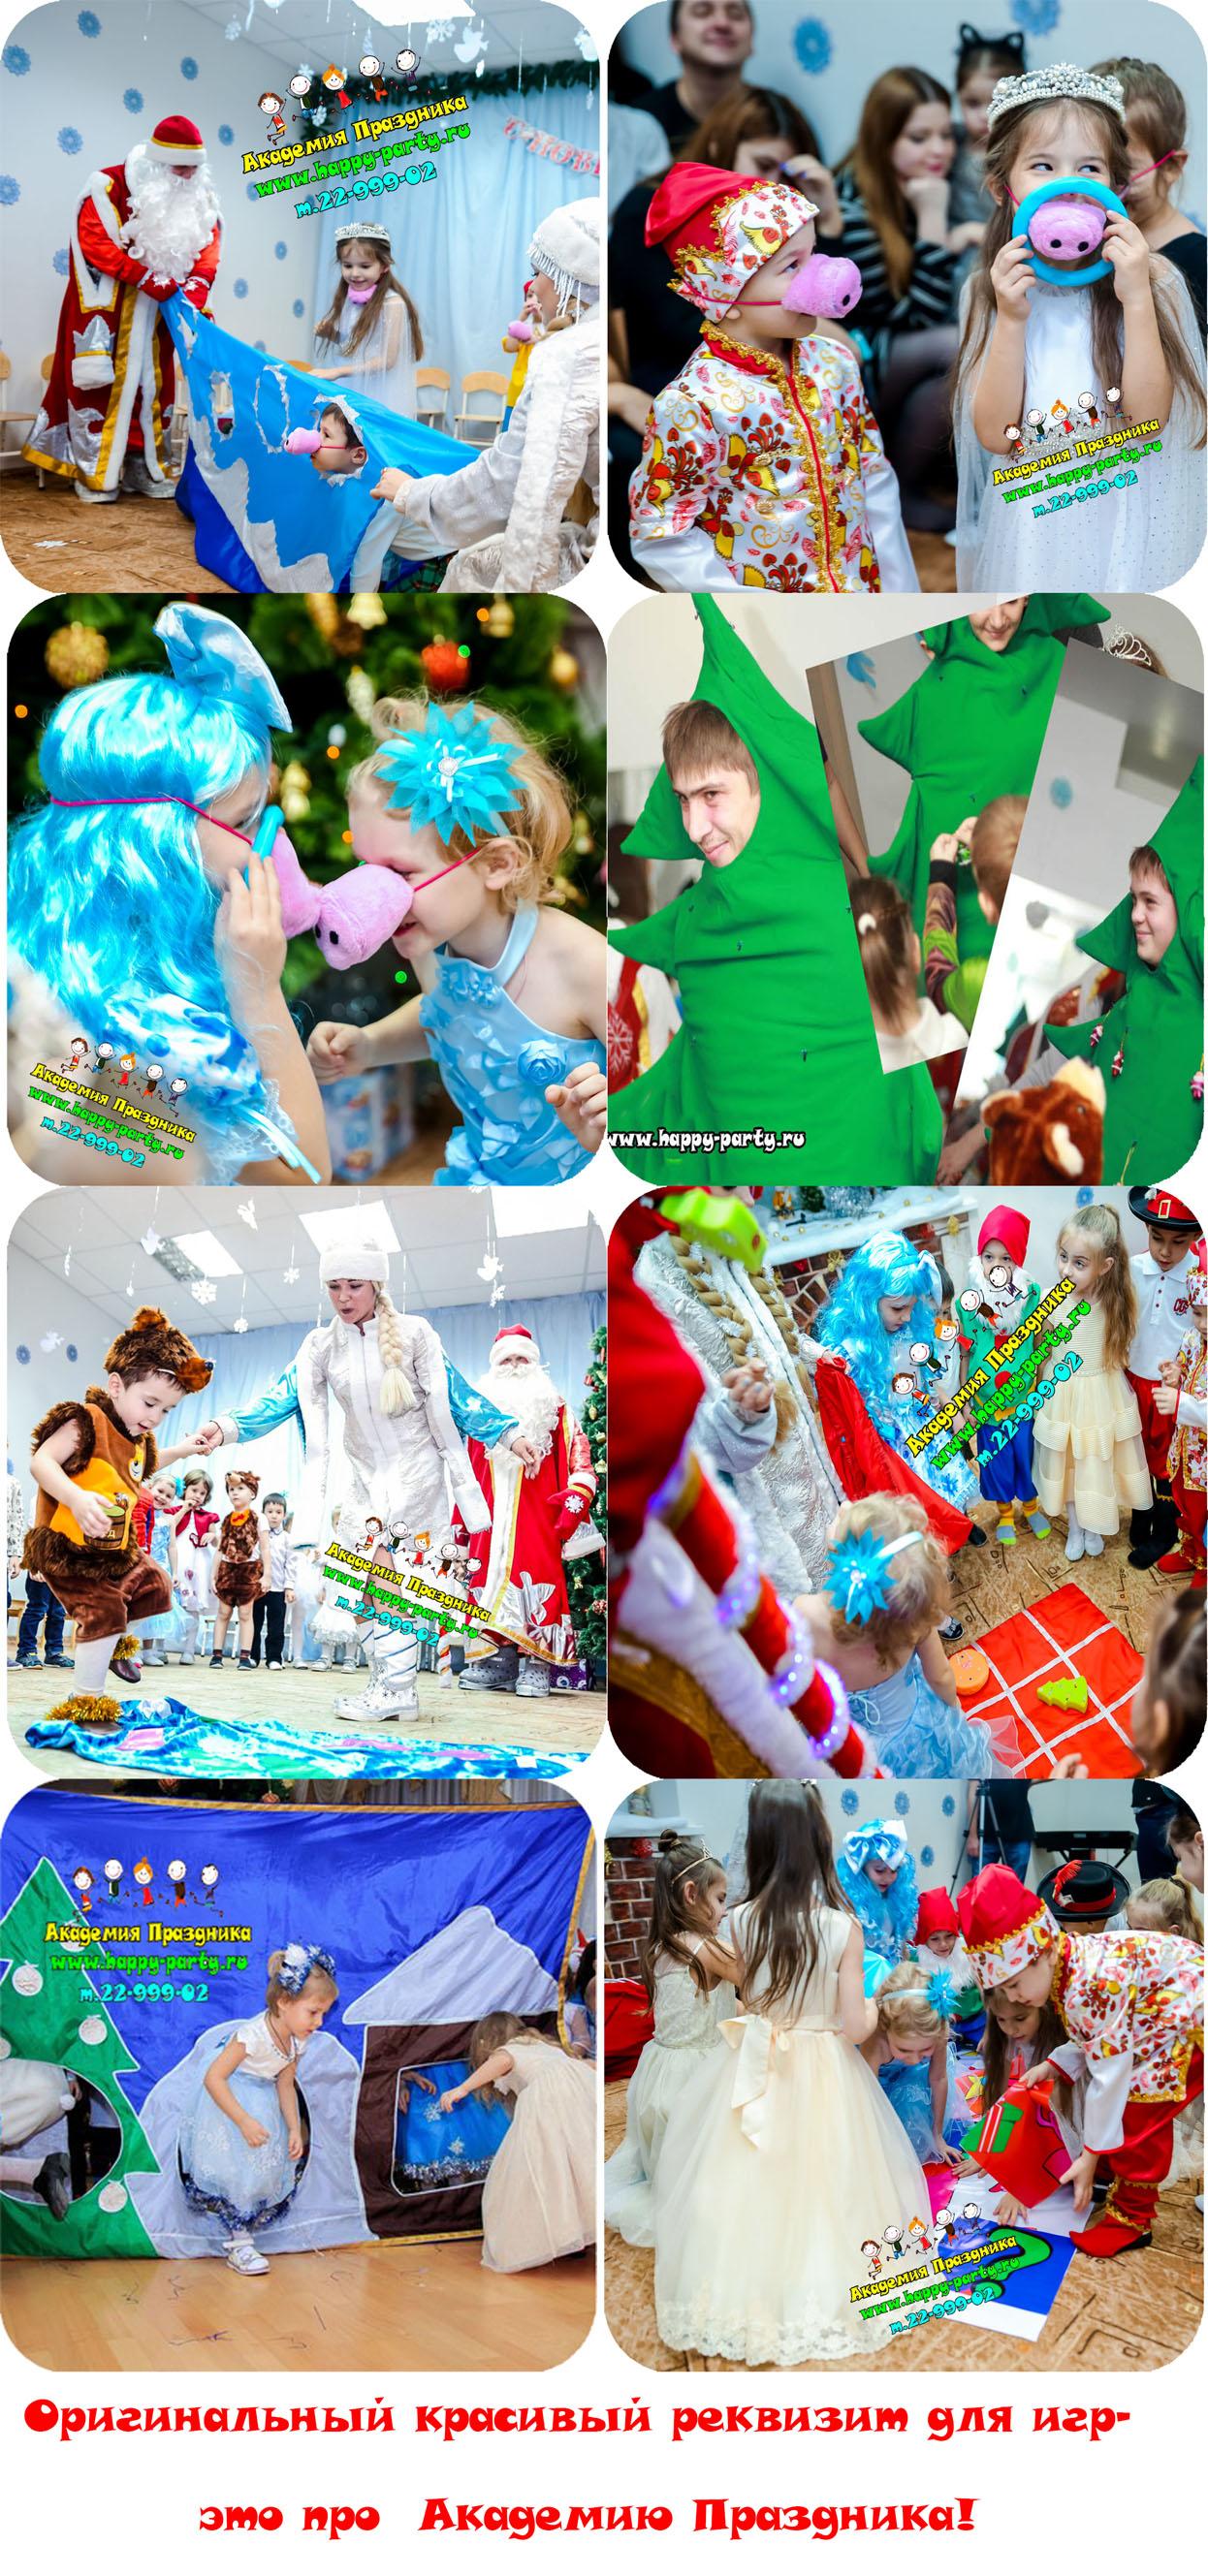 Дед Морози и Снегурочка вызов на дом